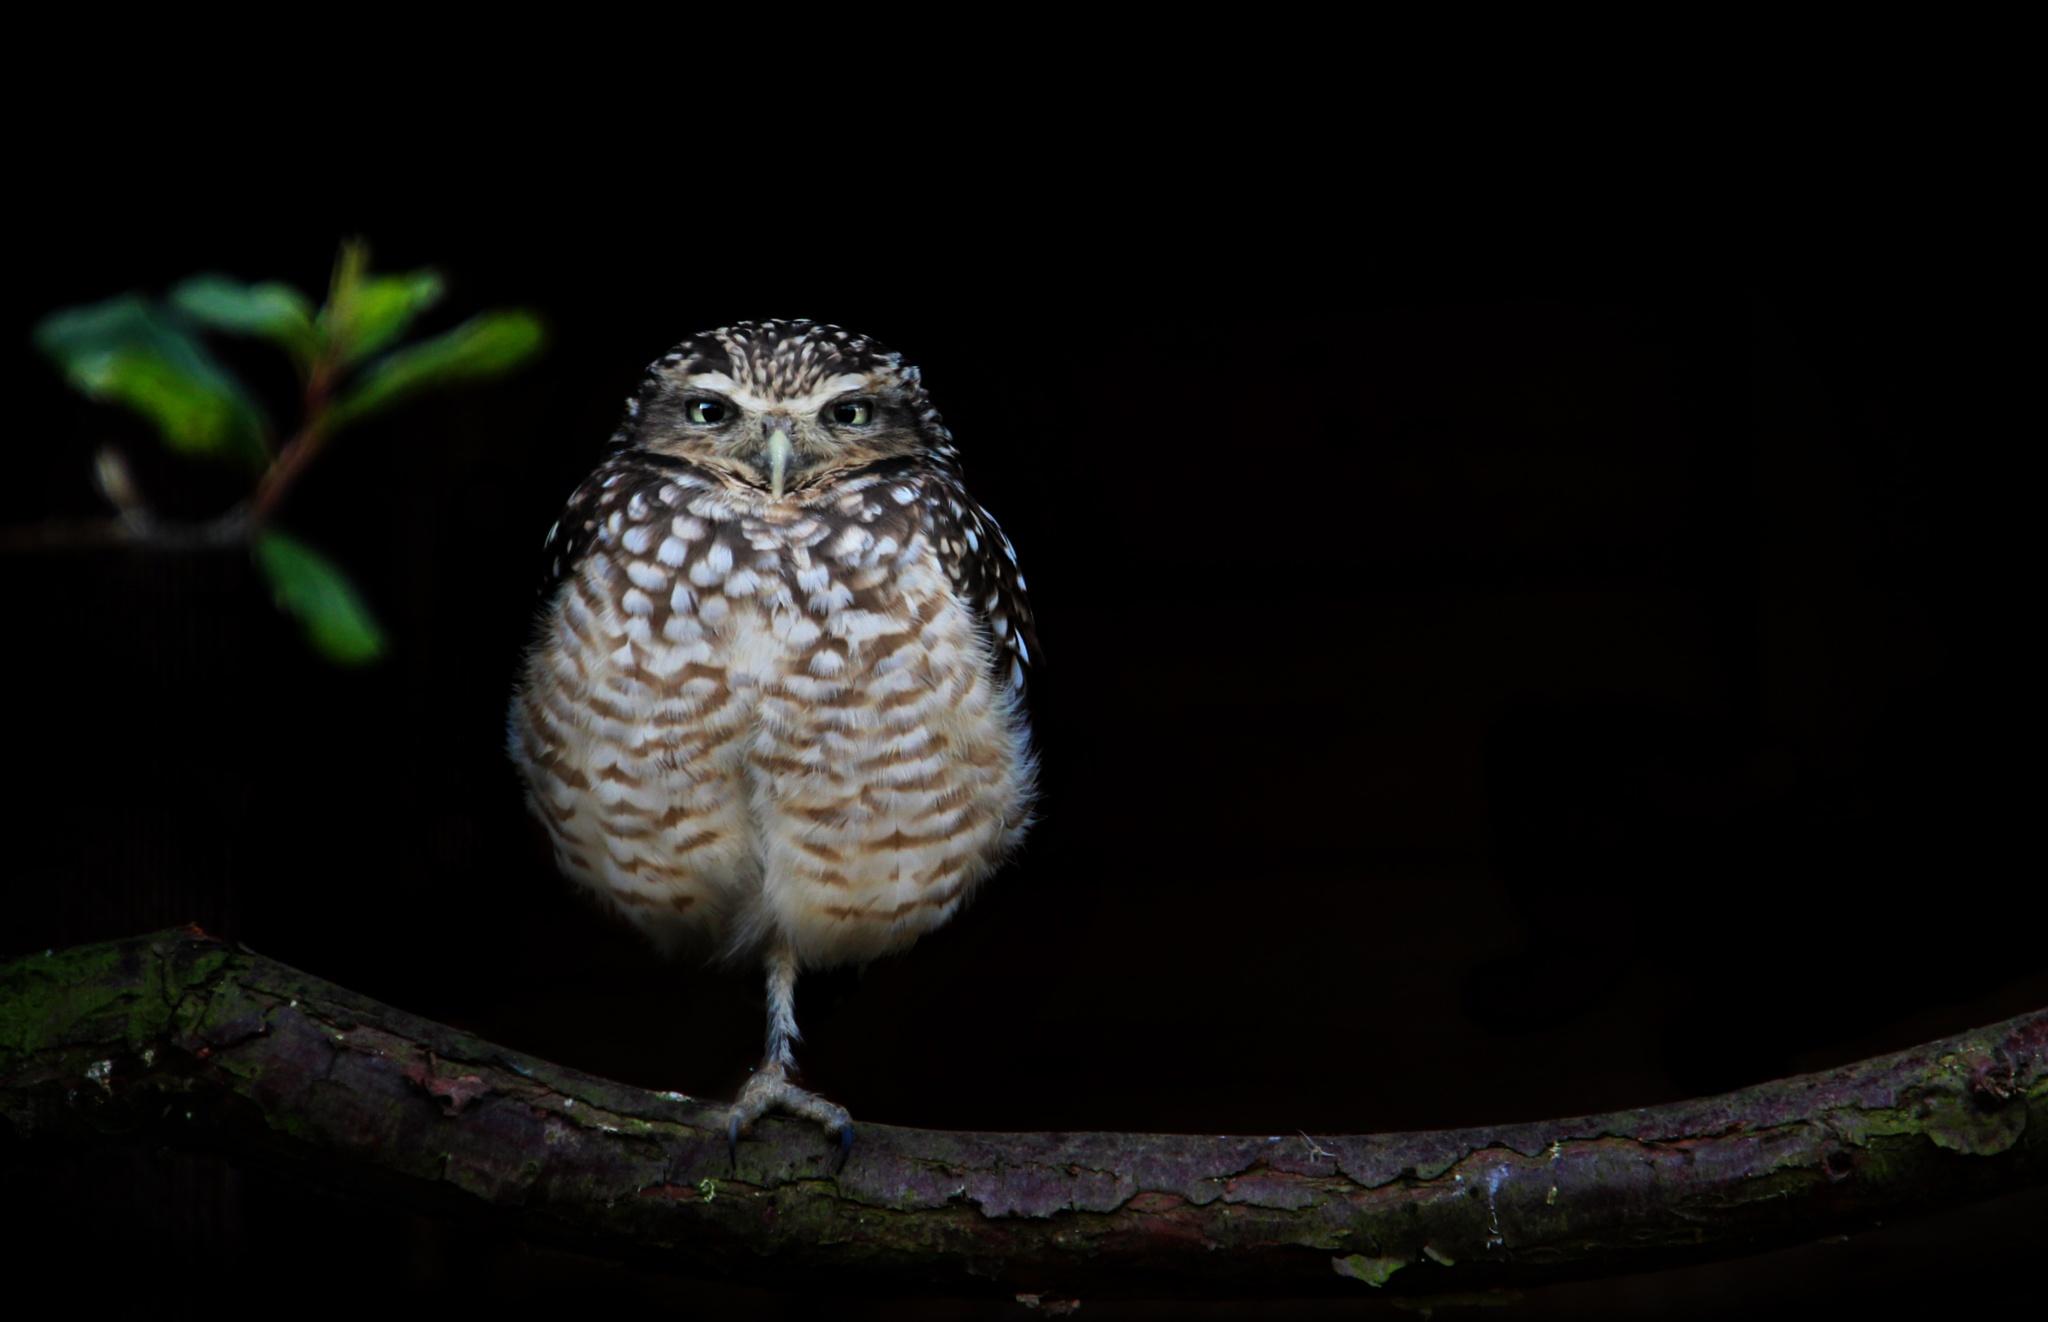 Litle Owl by Stephanie Veronique